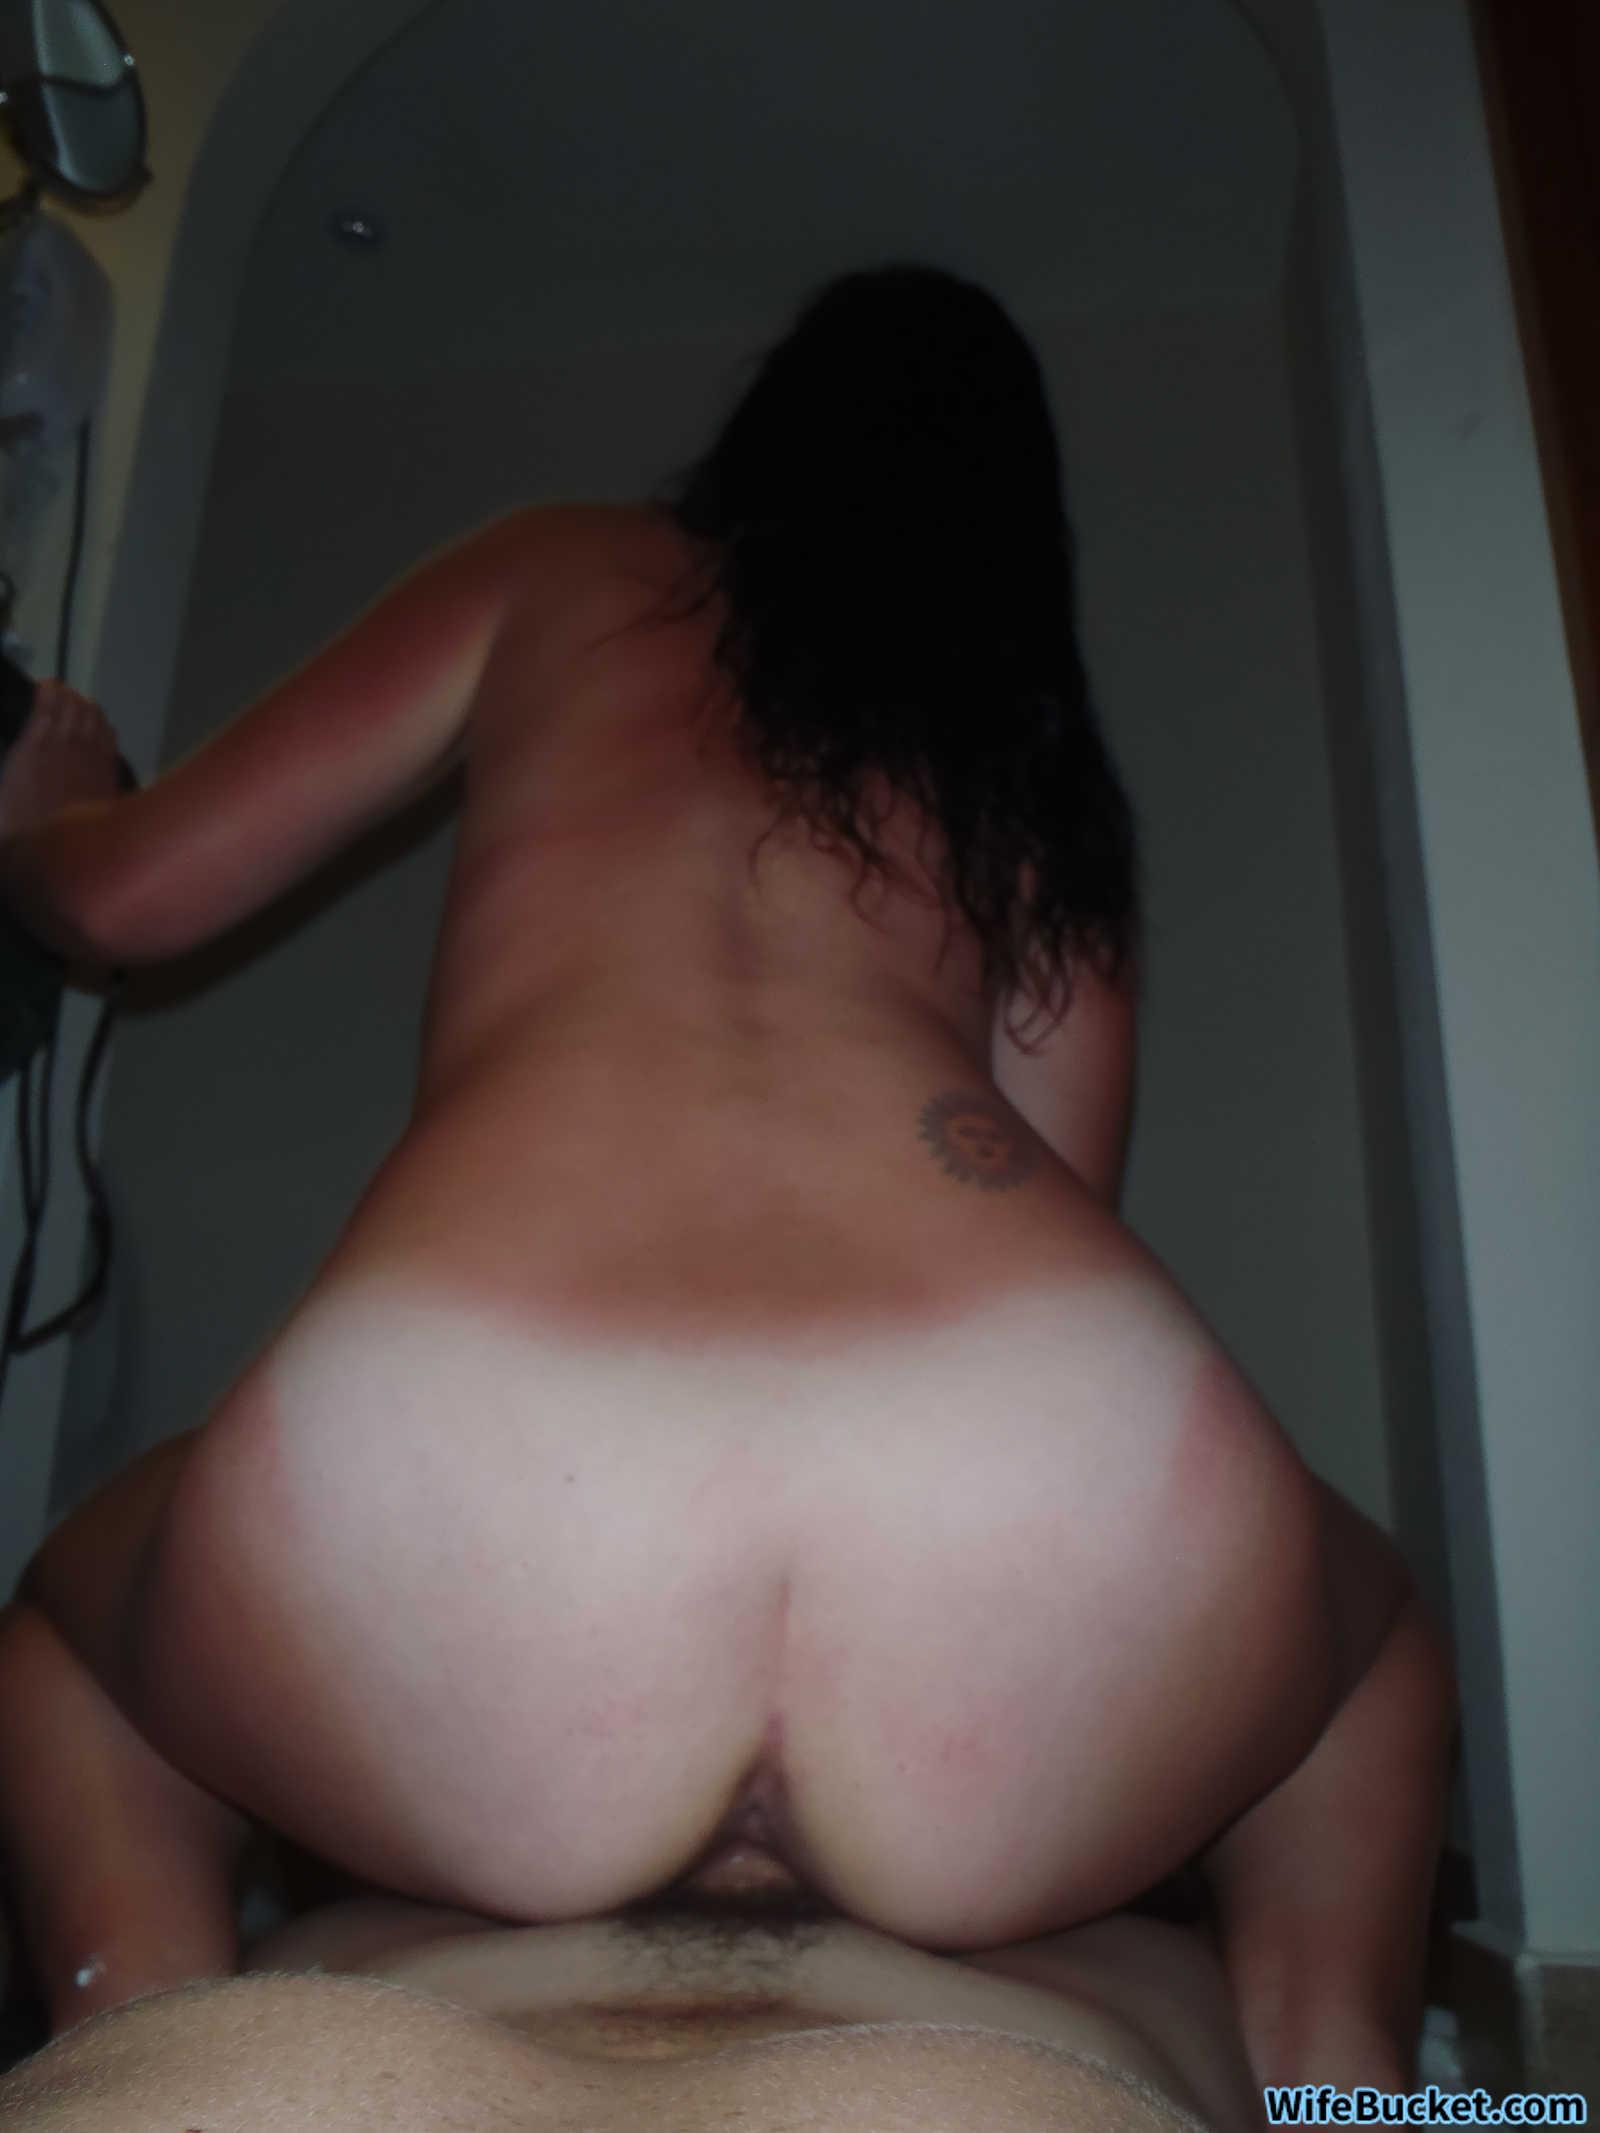 Sex My Wife Pics